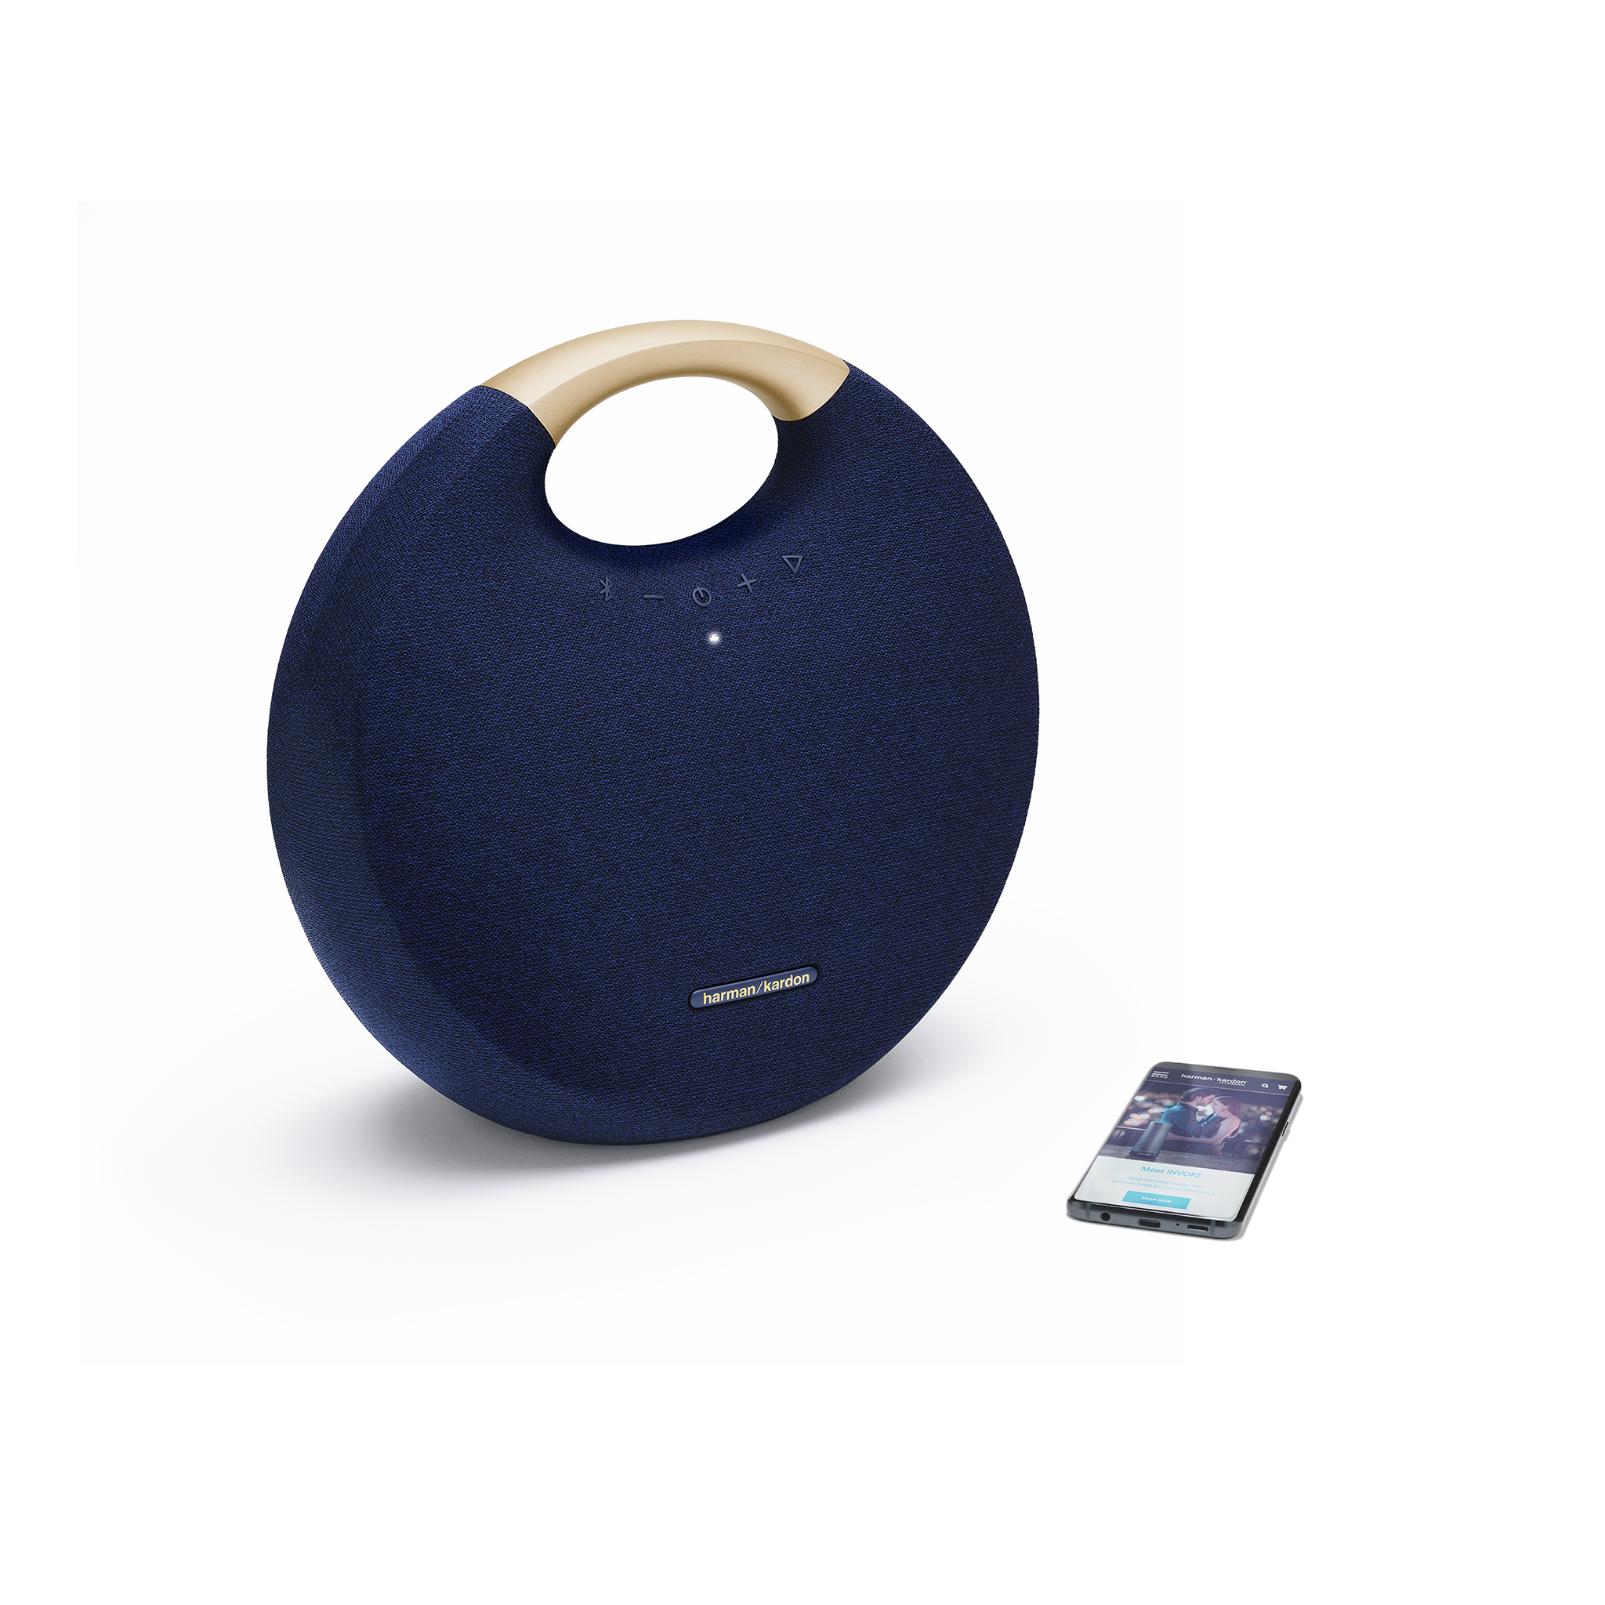 Onyx Studio 6 - Blue - Portable Bluetooth speaker - Detailshot 1